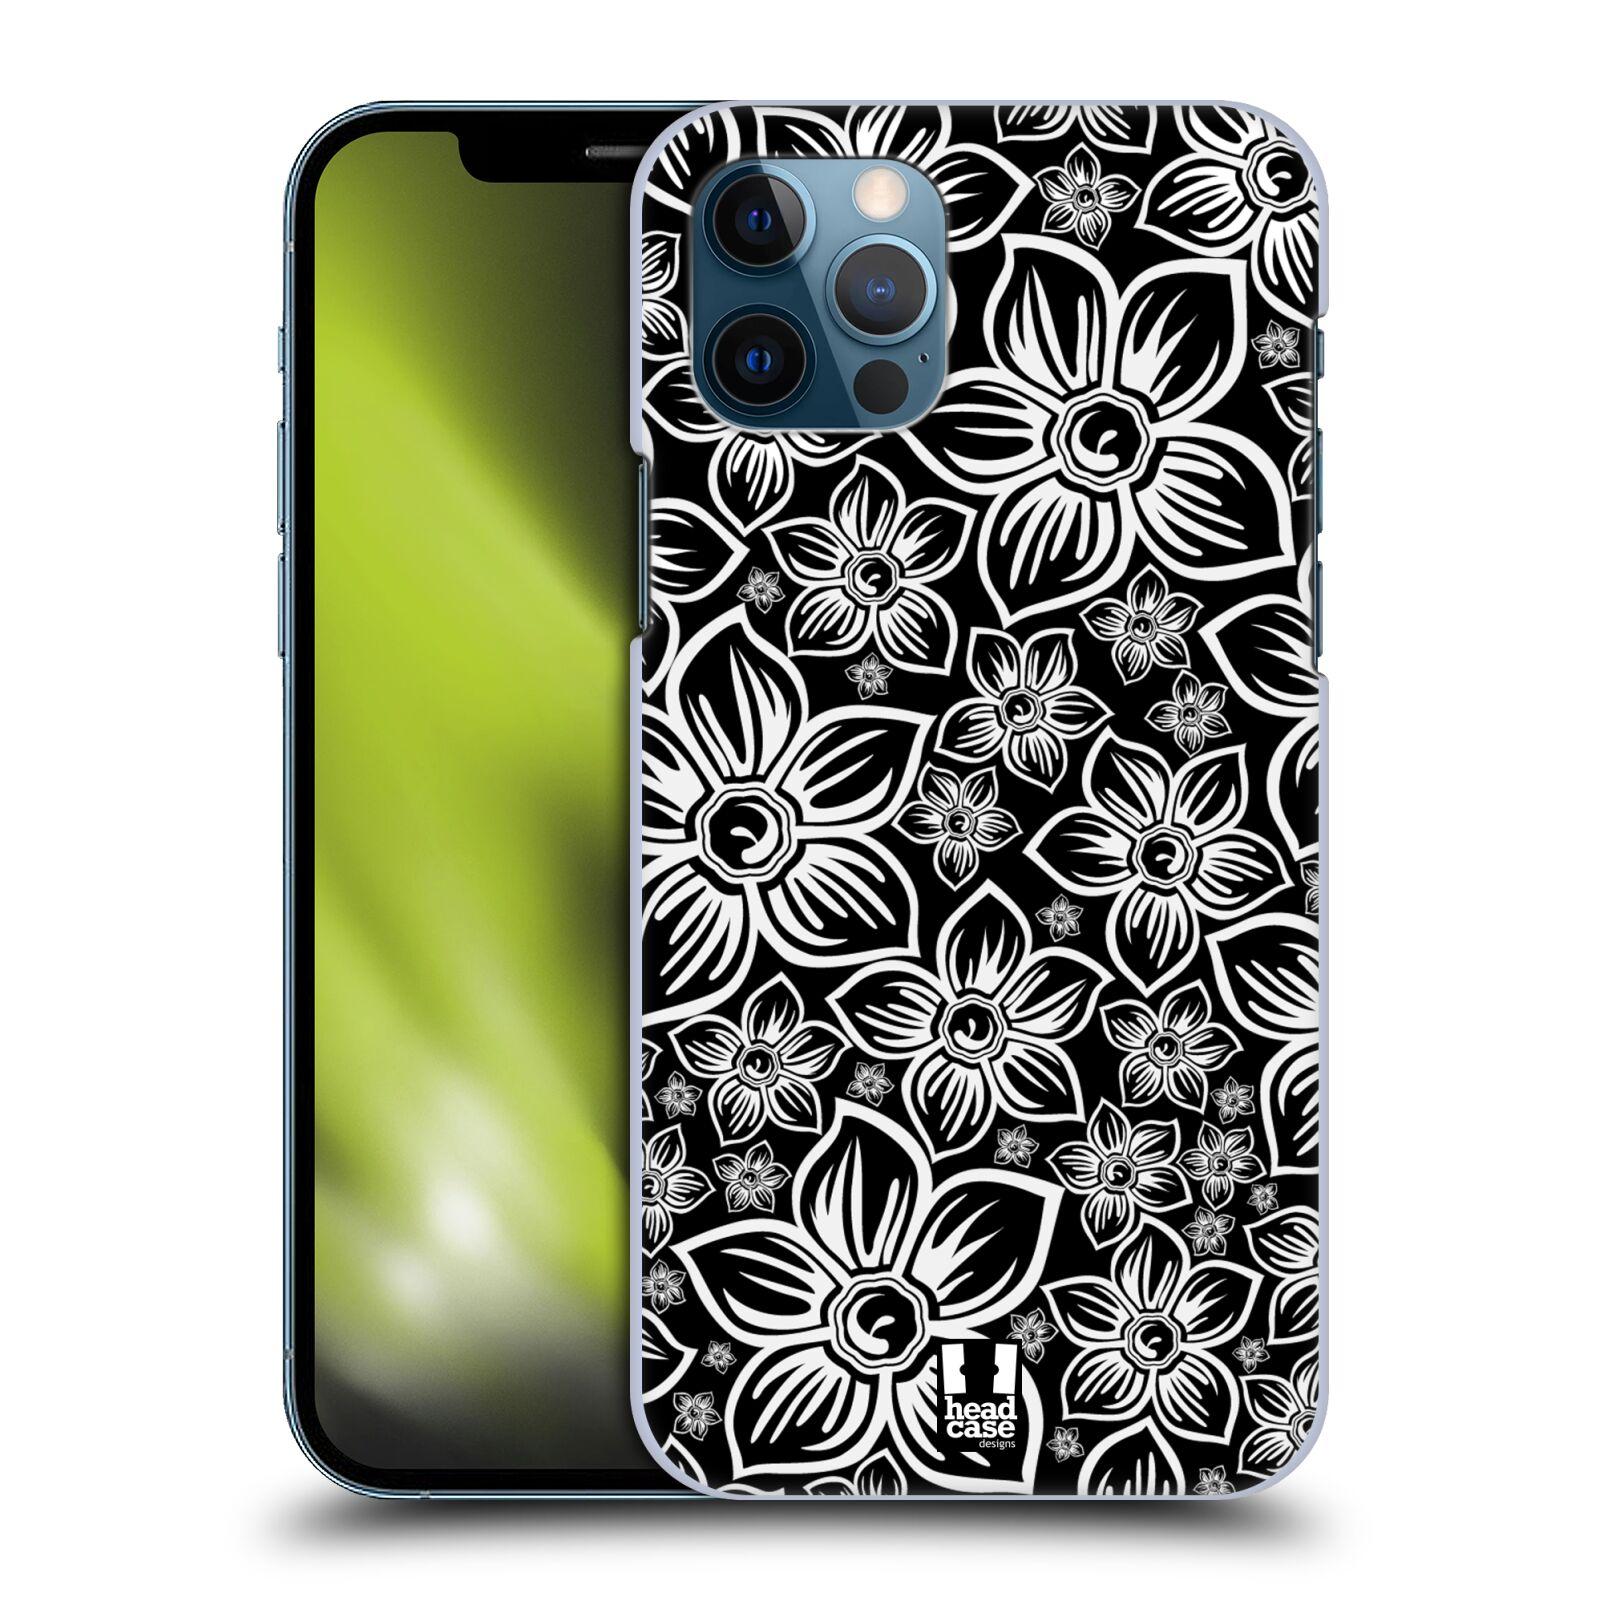 Plastové pouzdro na mobil Apple iPhone 12 / 12 Pro - Head Case - FLORAL DAISY